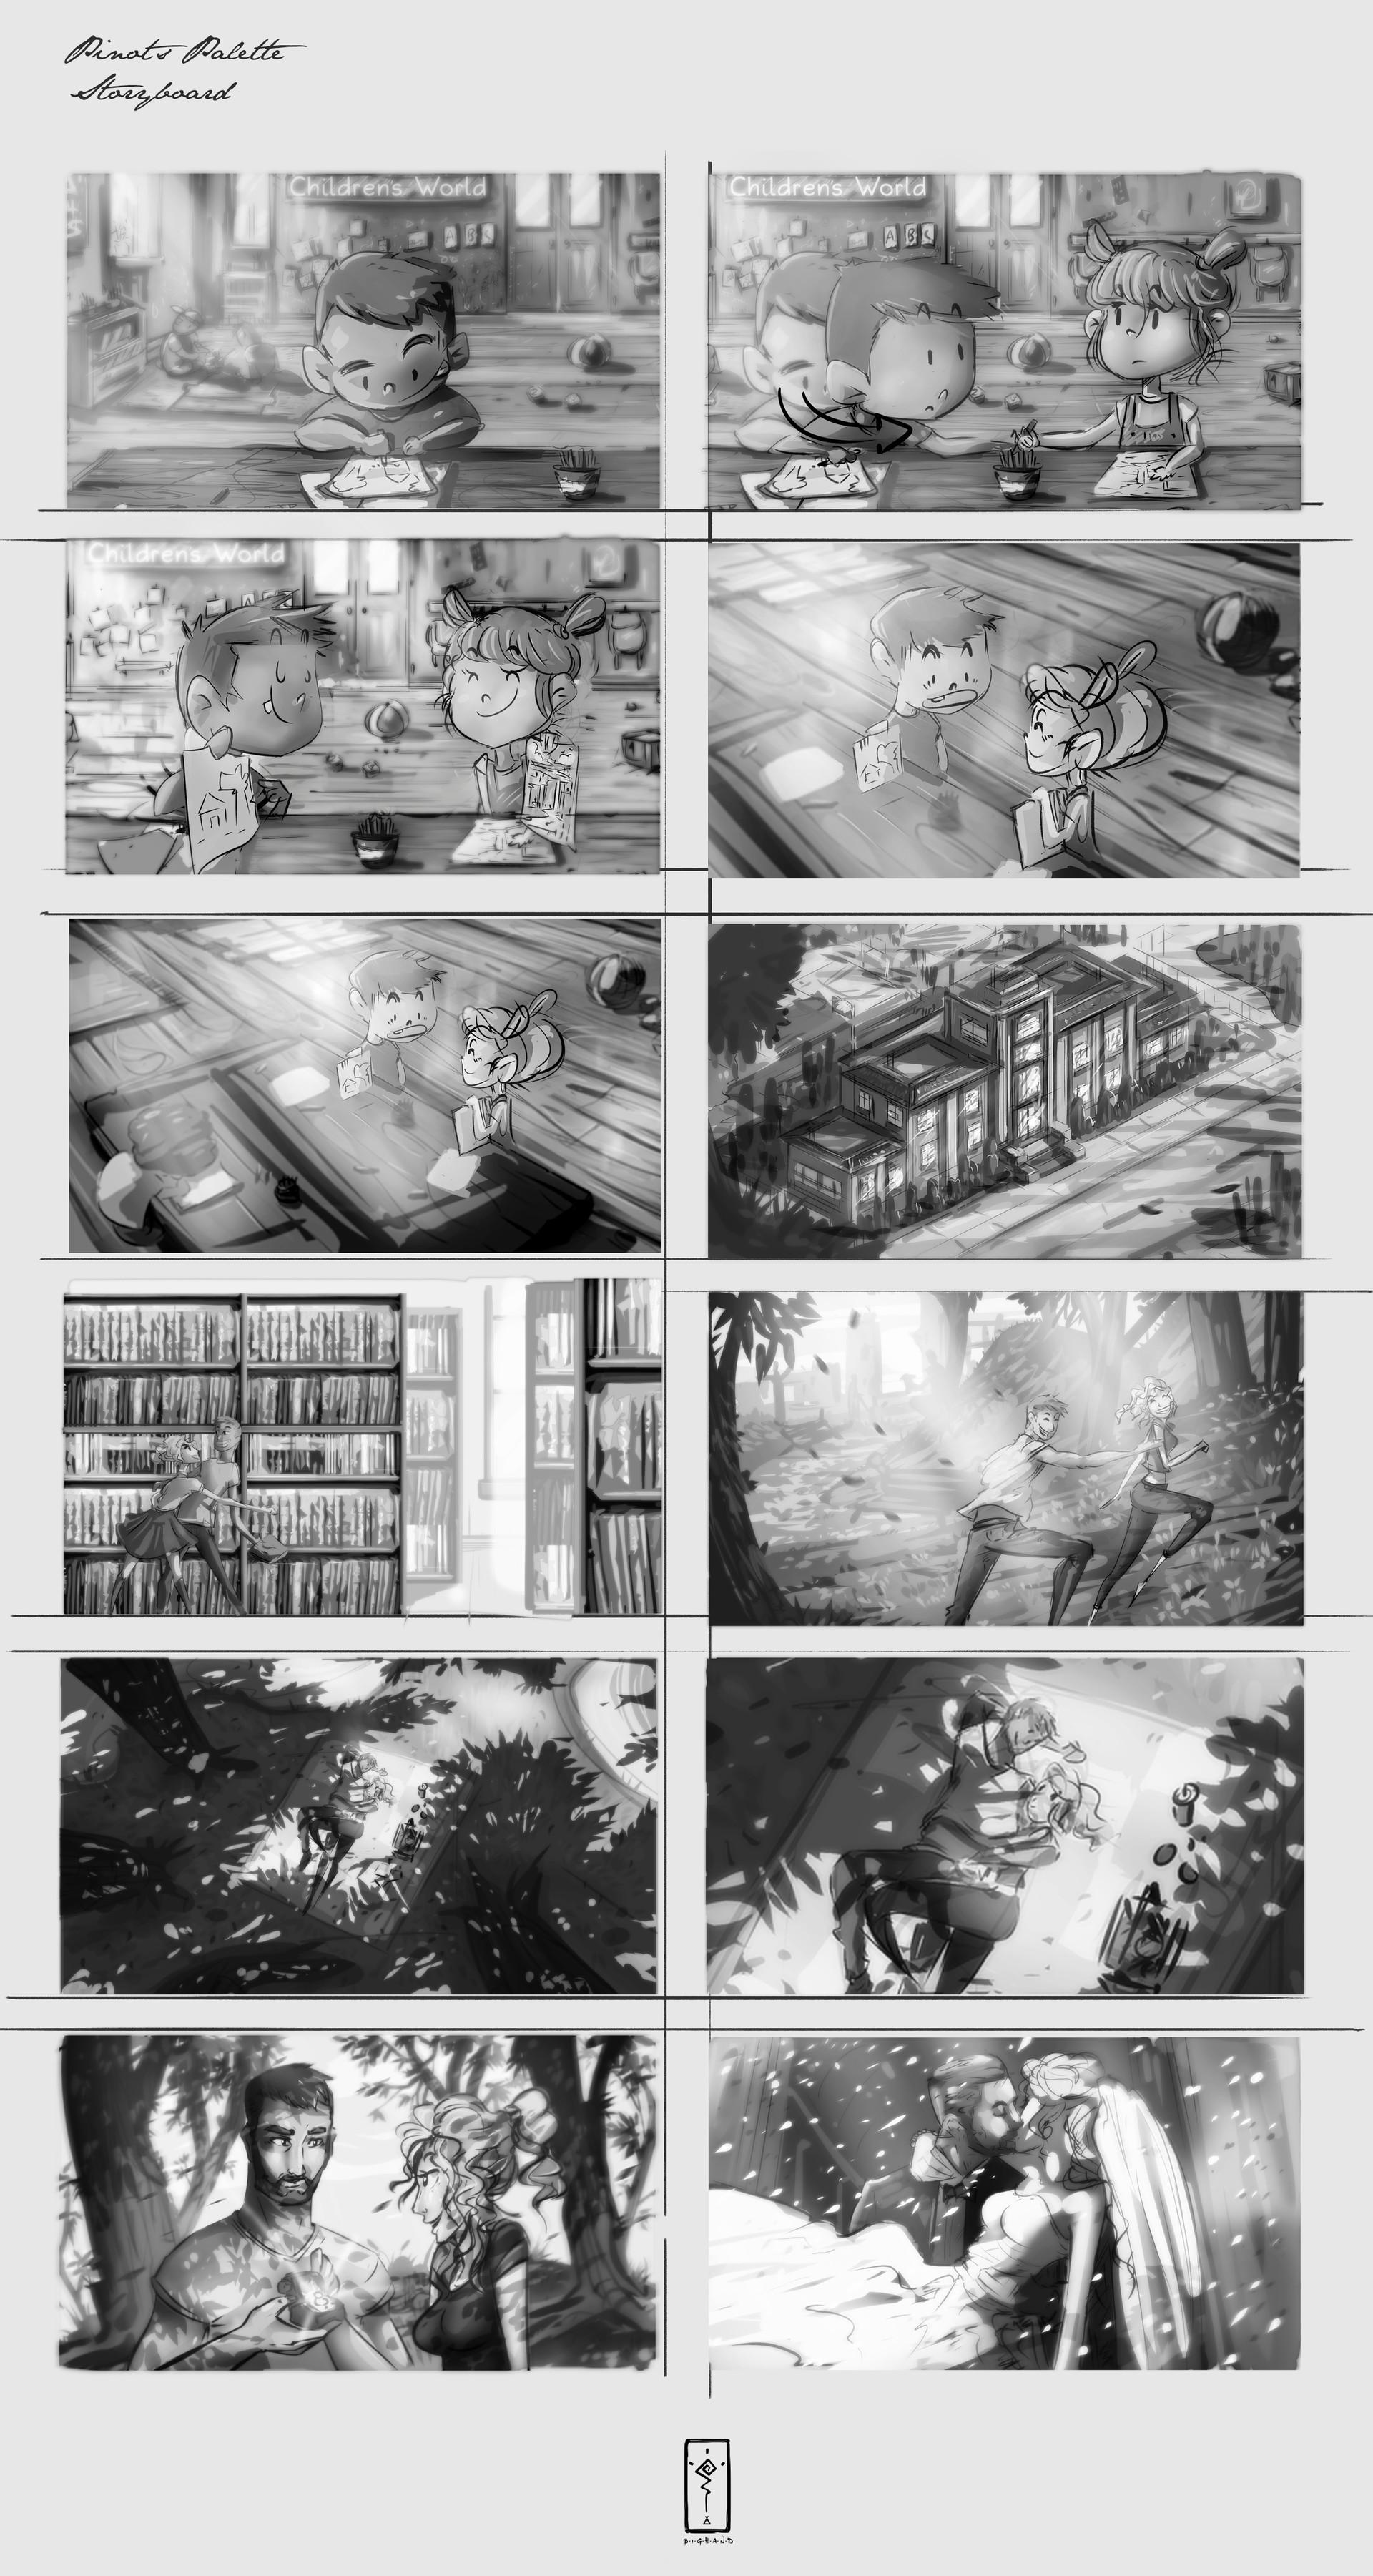 Christian benavides storyboard frames 1 10